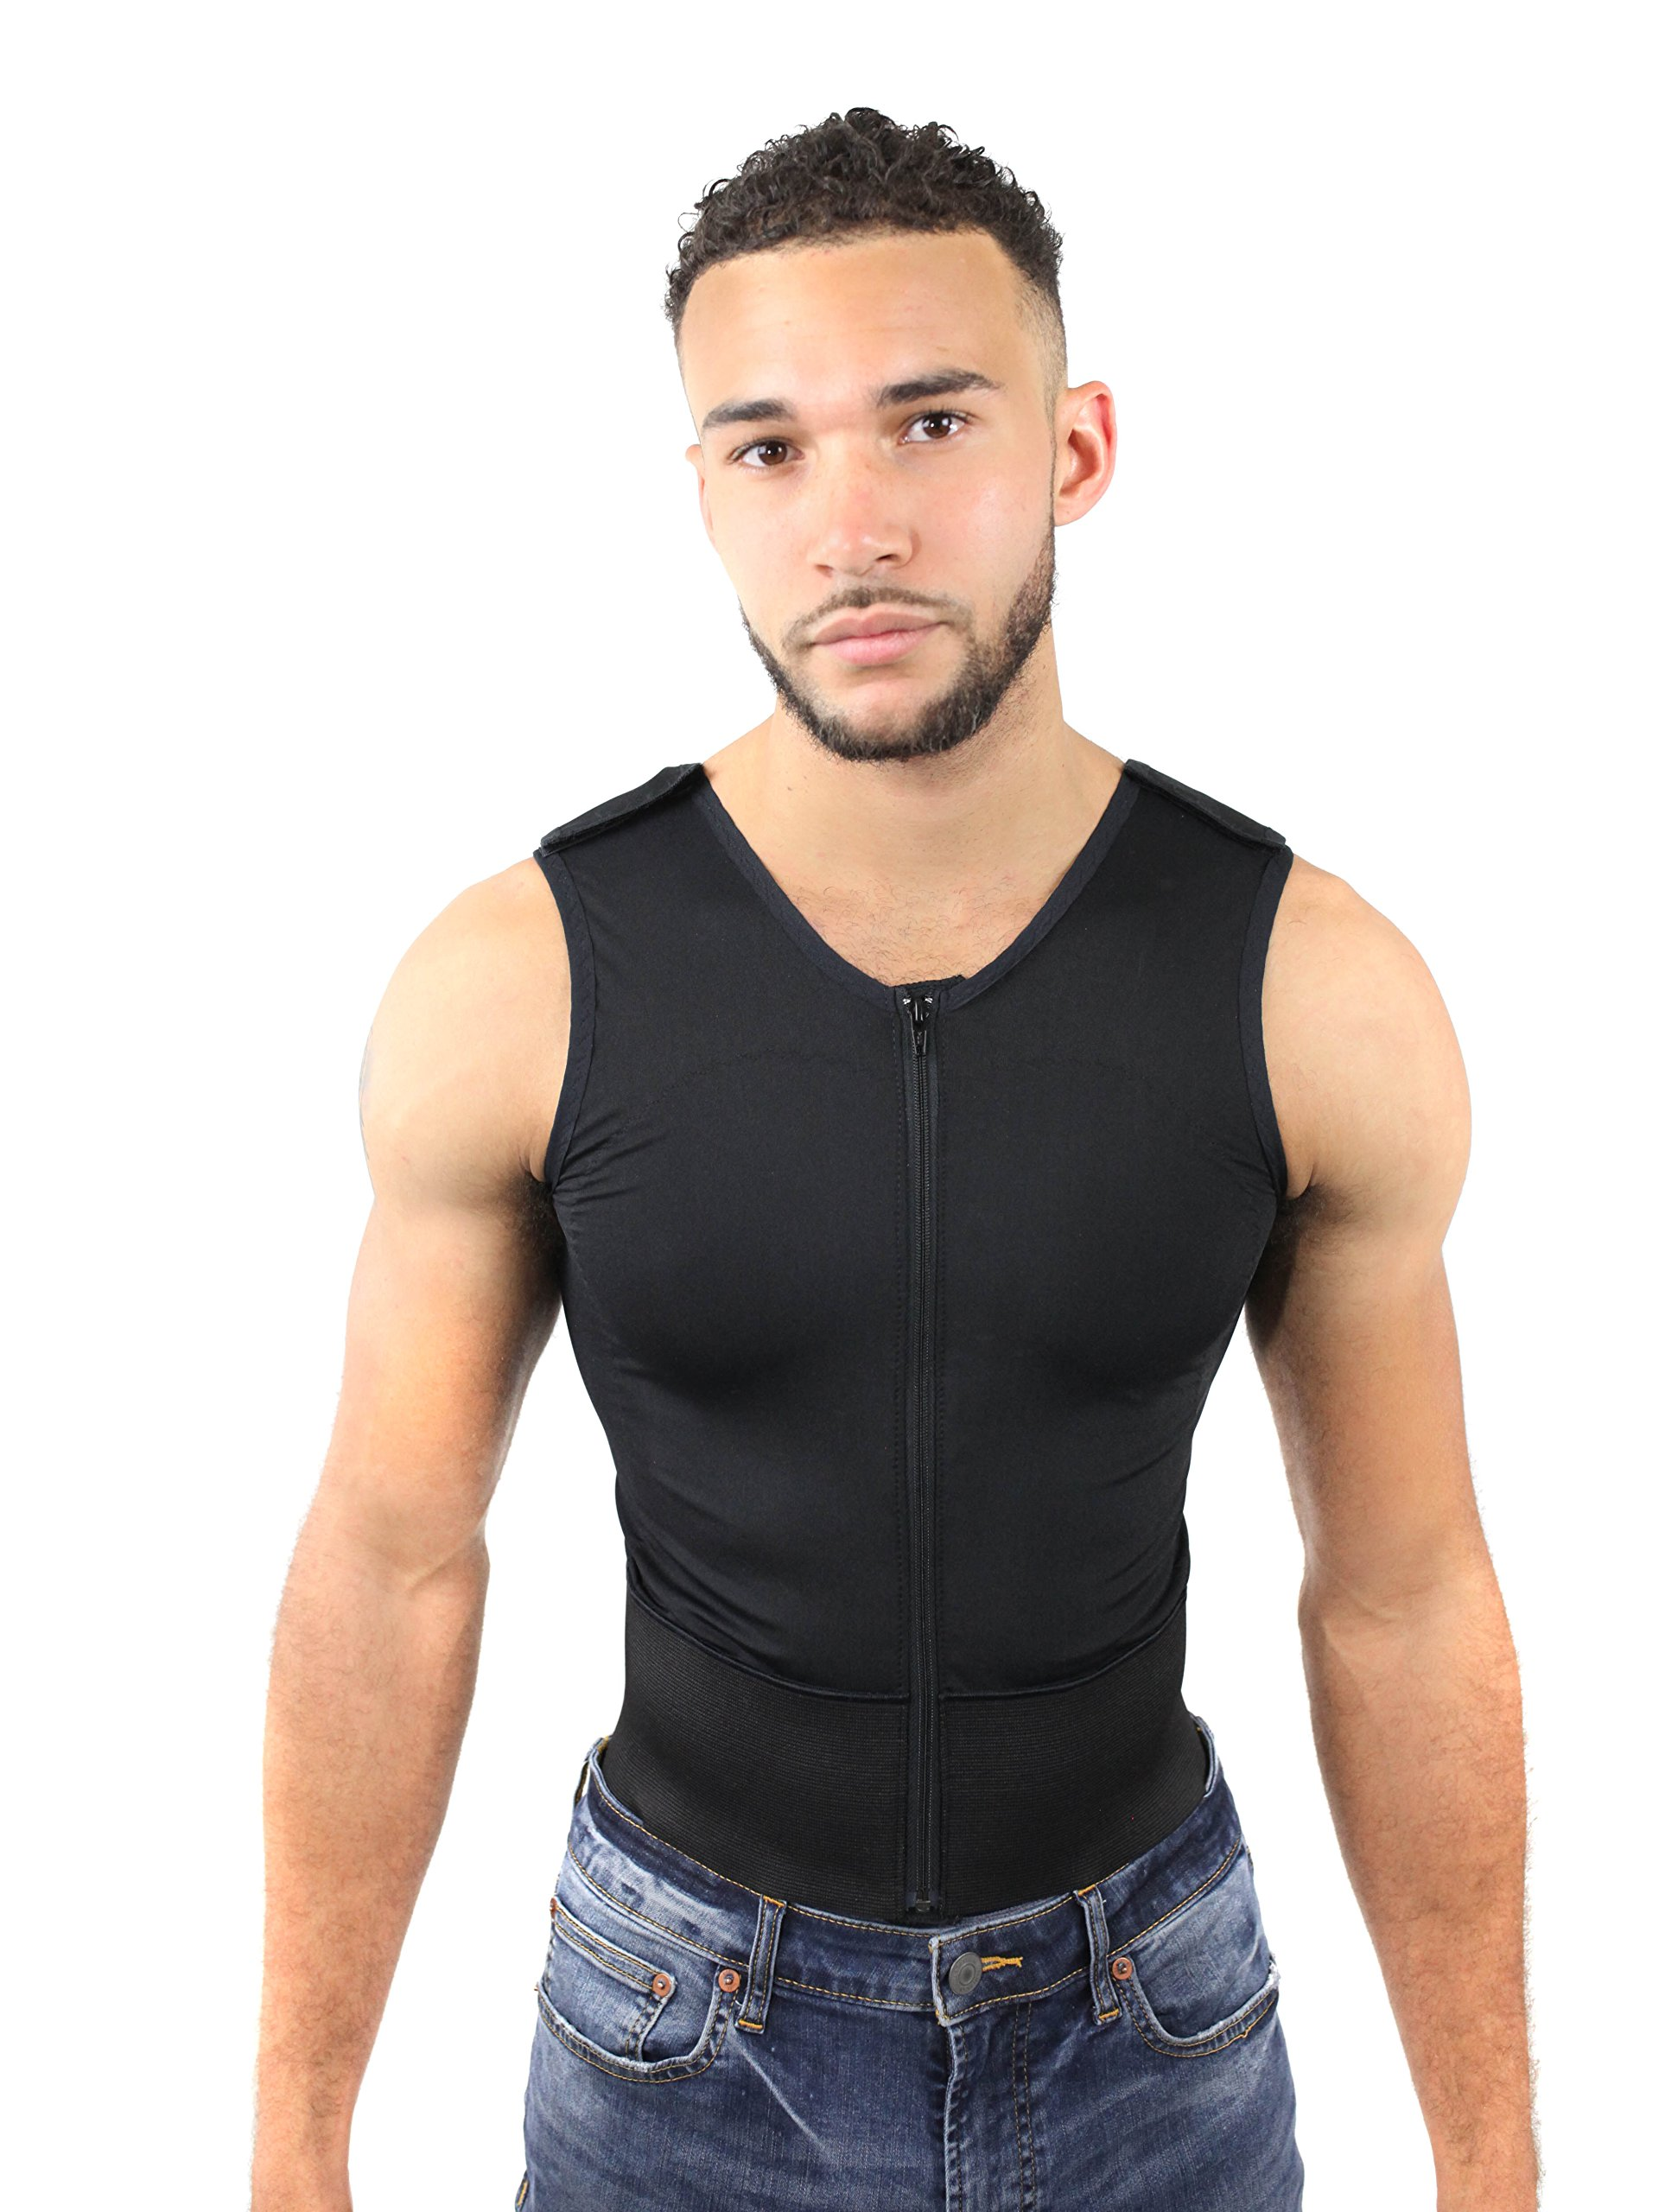 ContourMD Men's Abdominal Binder, Gynecomastia Compression Vest, Male Weight Loss (S11)